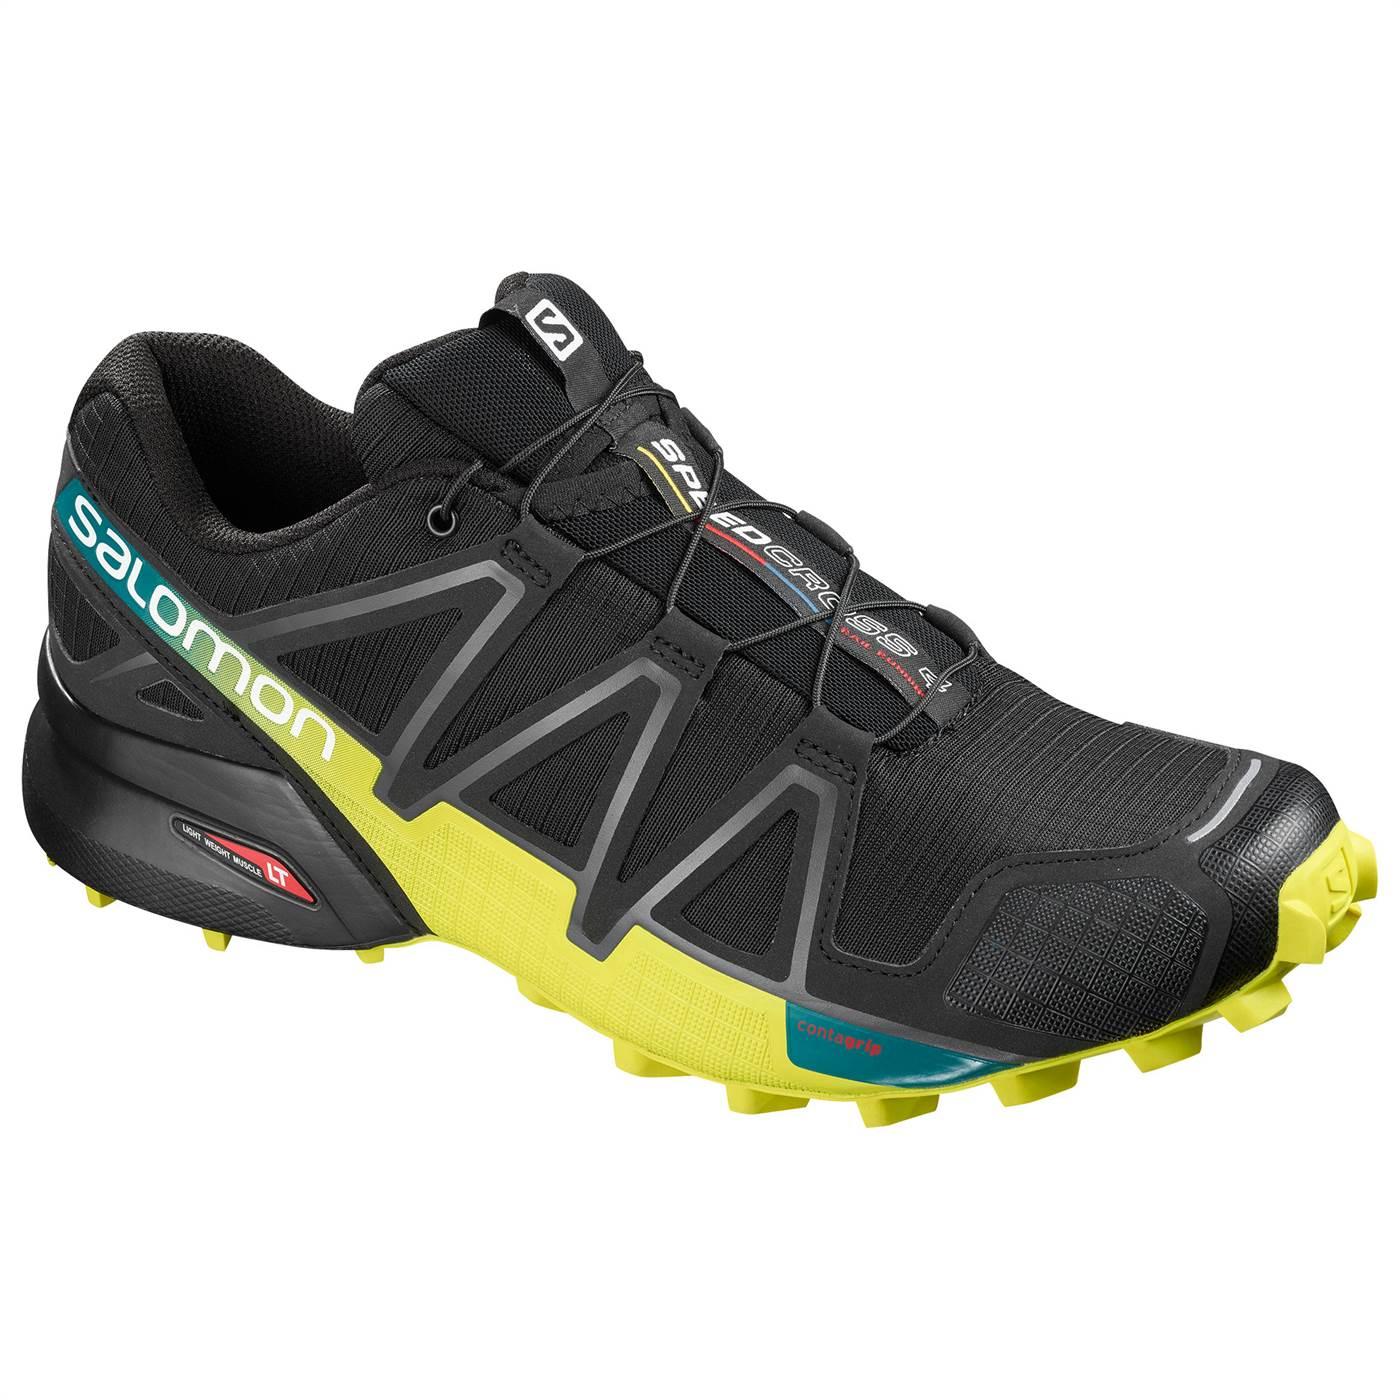 Speedcross 4 Shoe Black - Men's